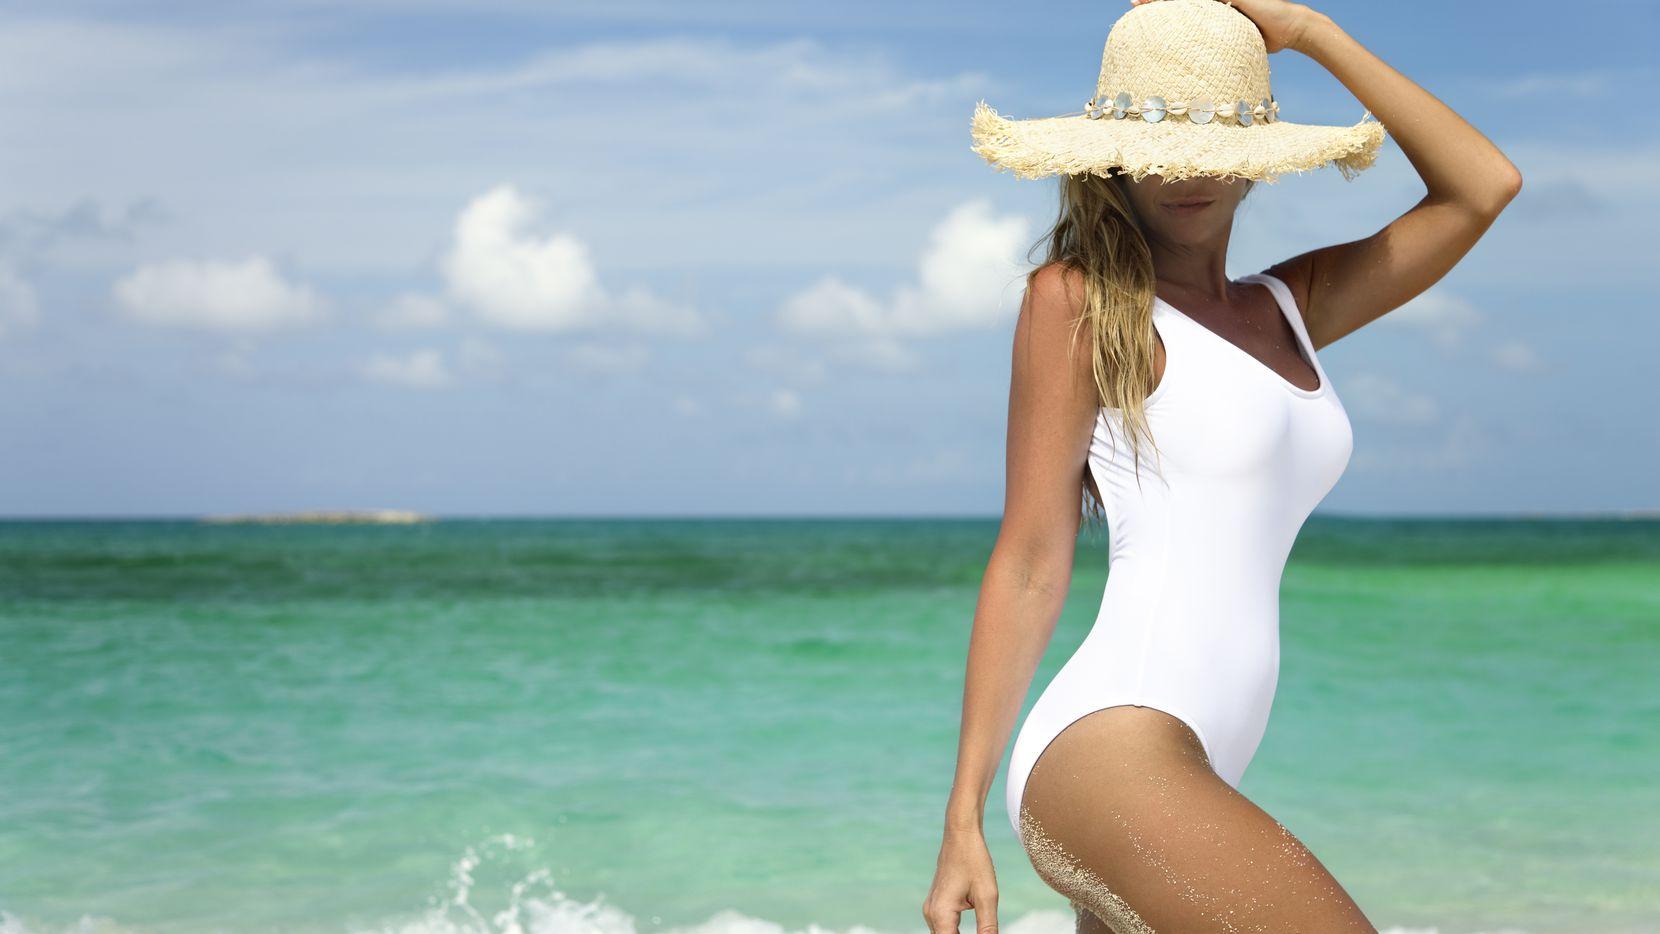 One-piece swimsuit.